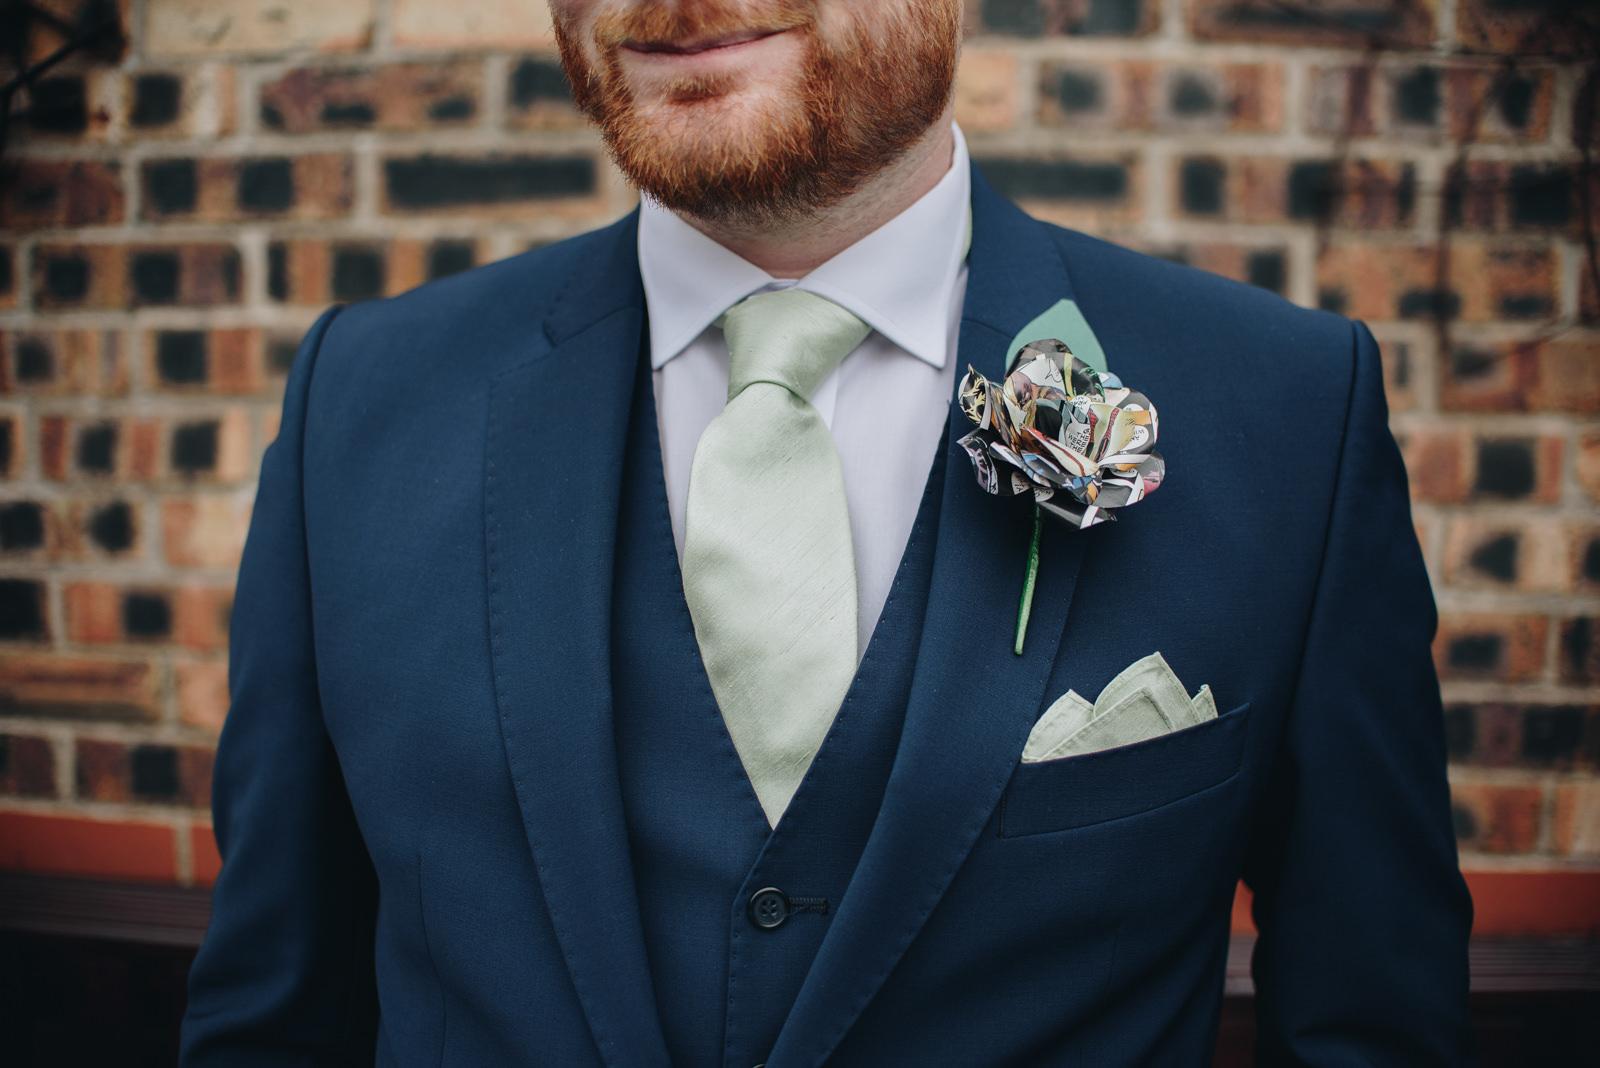 Alternative Manchester North West Wedding Photography, The Wellbeing Farm Wedding Photography | The Pin-Up Bride